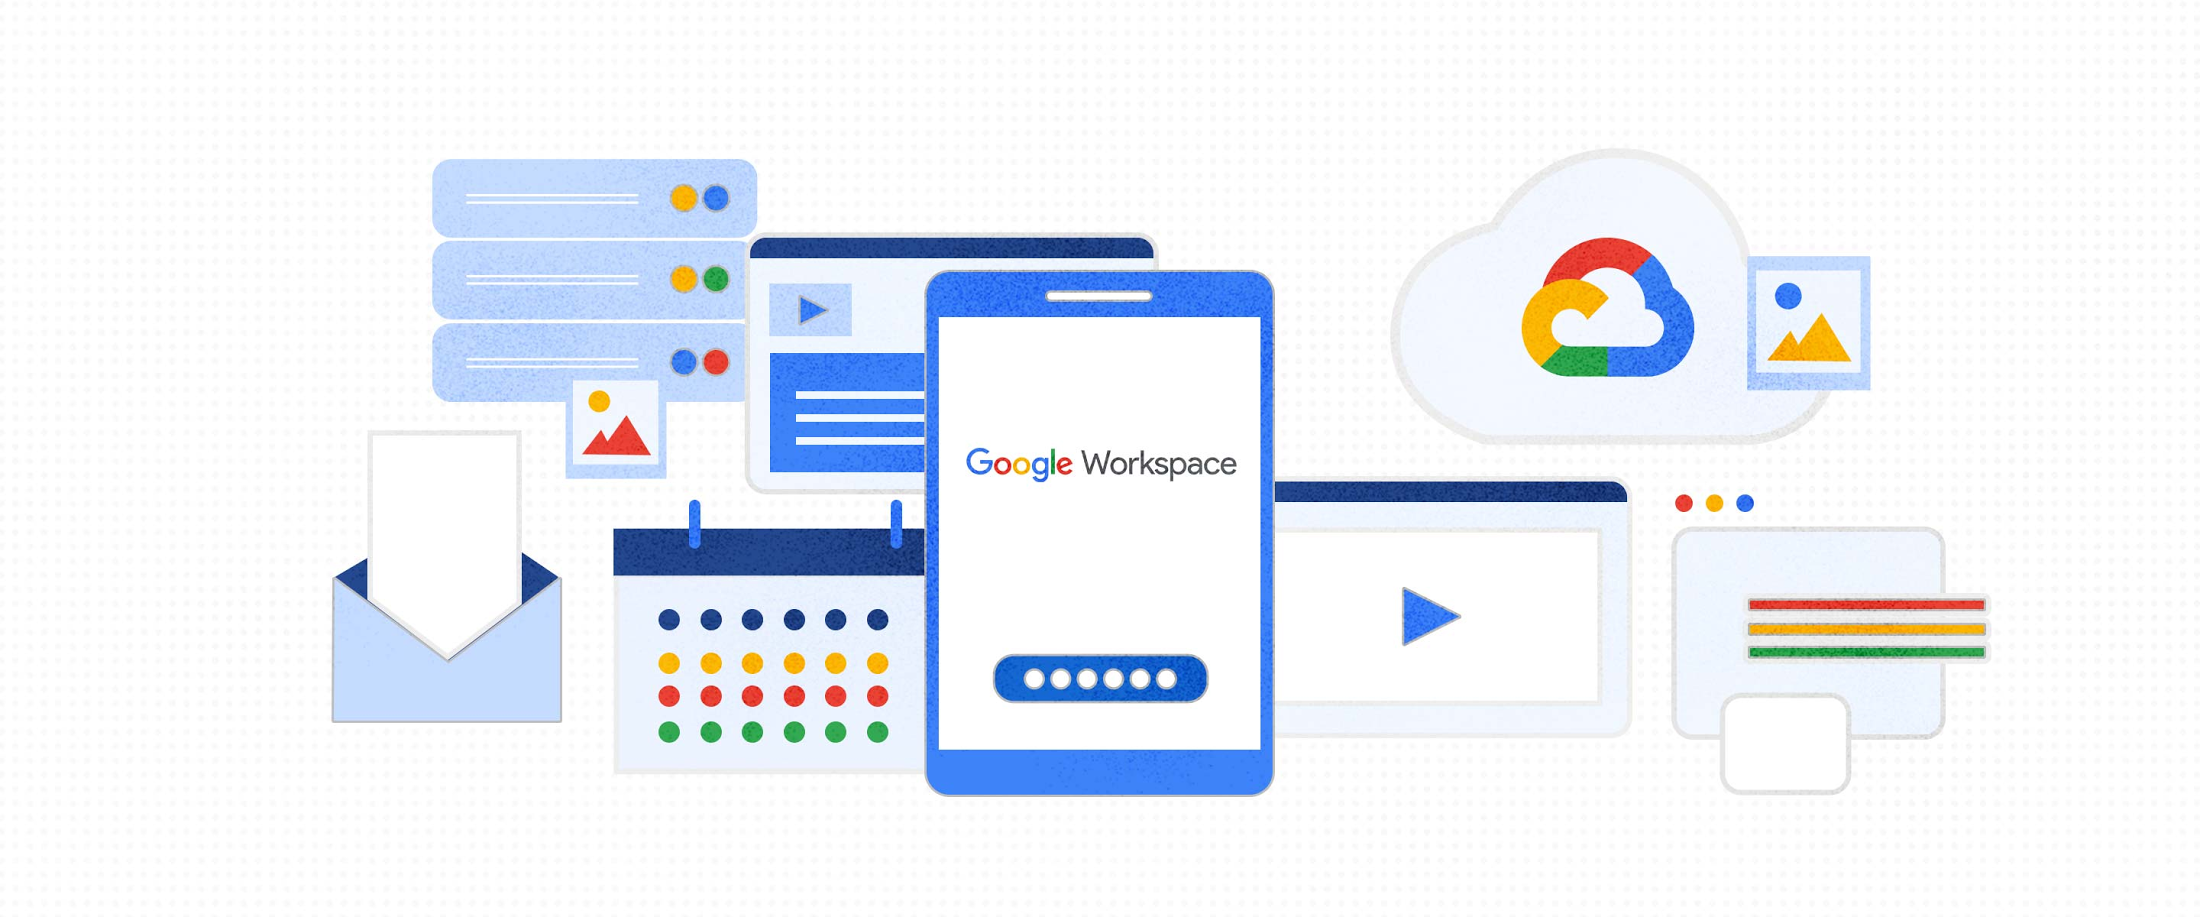 googworkspace